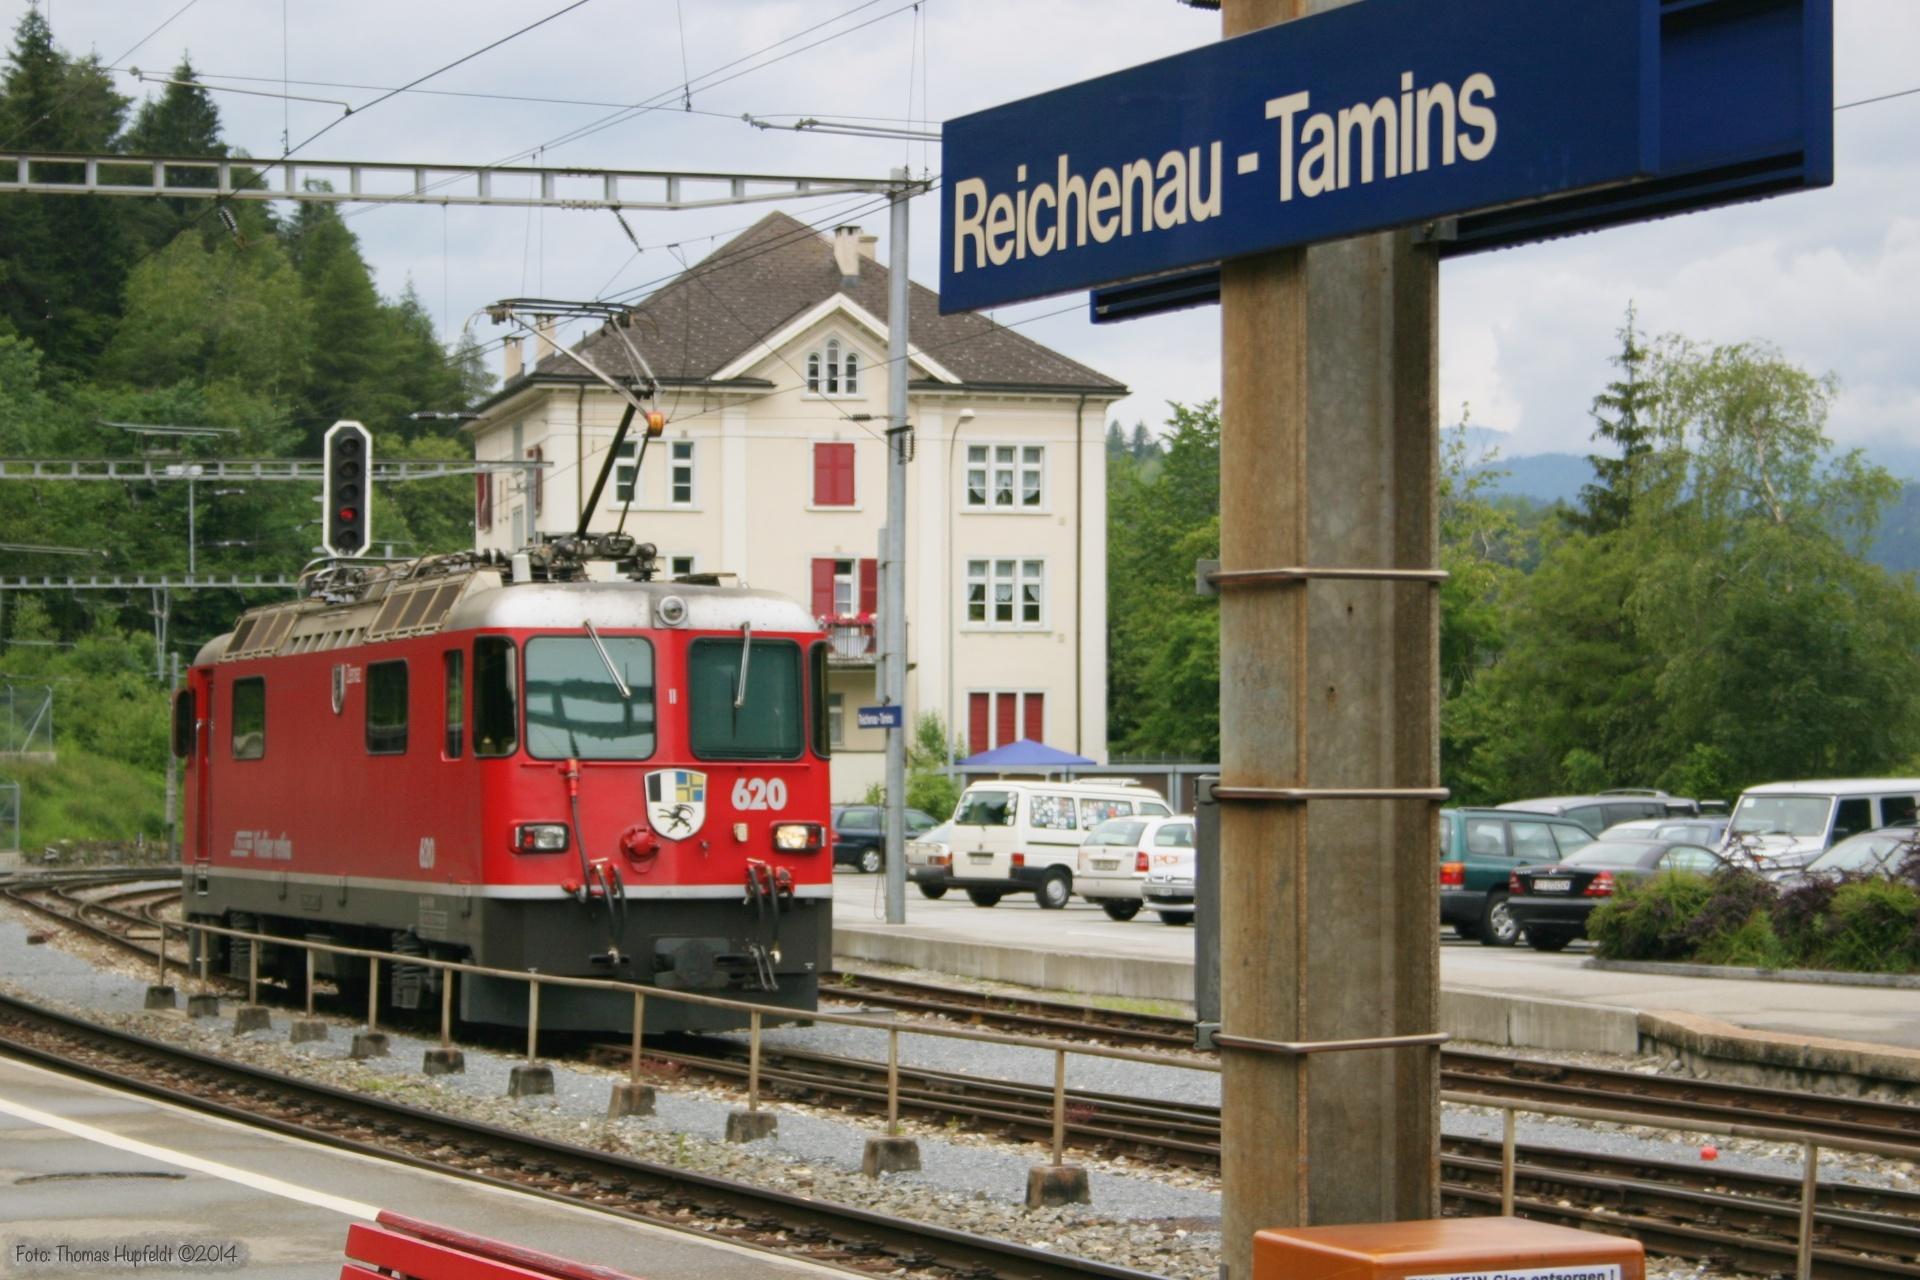 RhB Ge 4/4 II 620 ved Reichenau Tamins - 22.06.2004